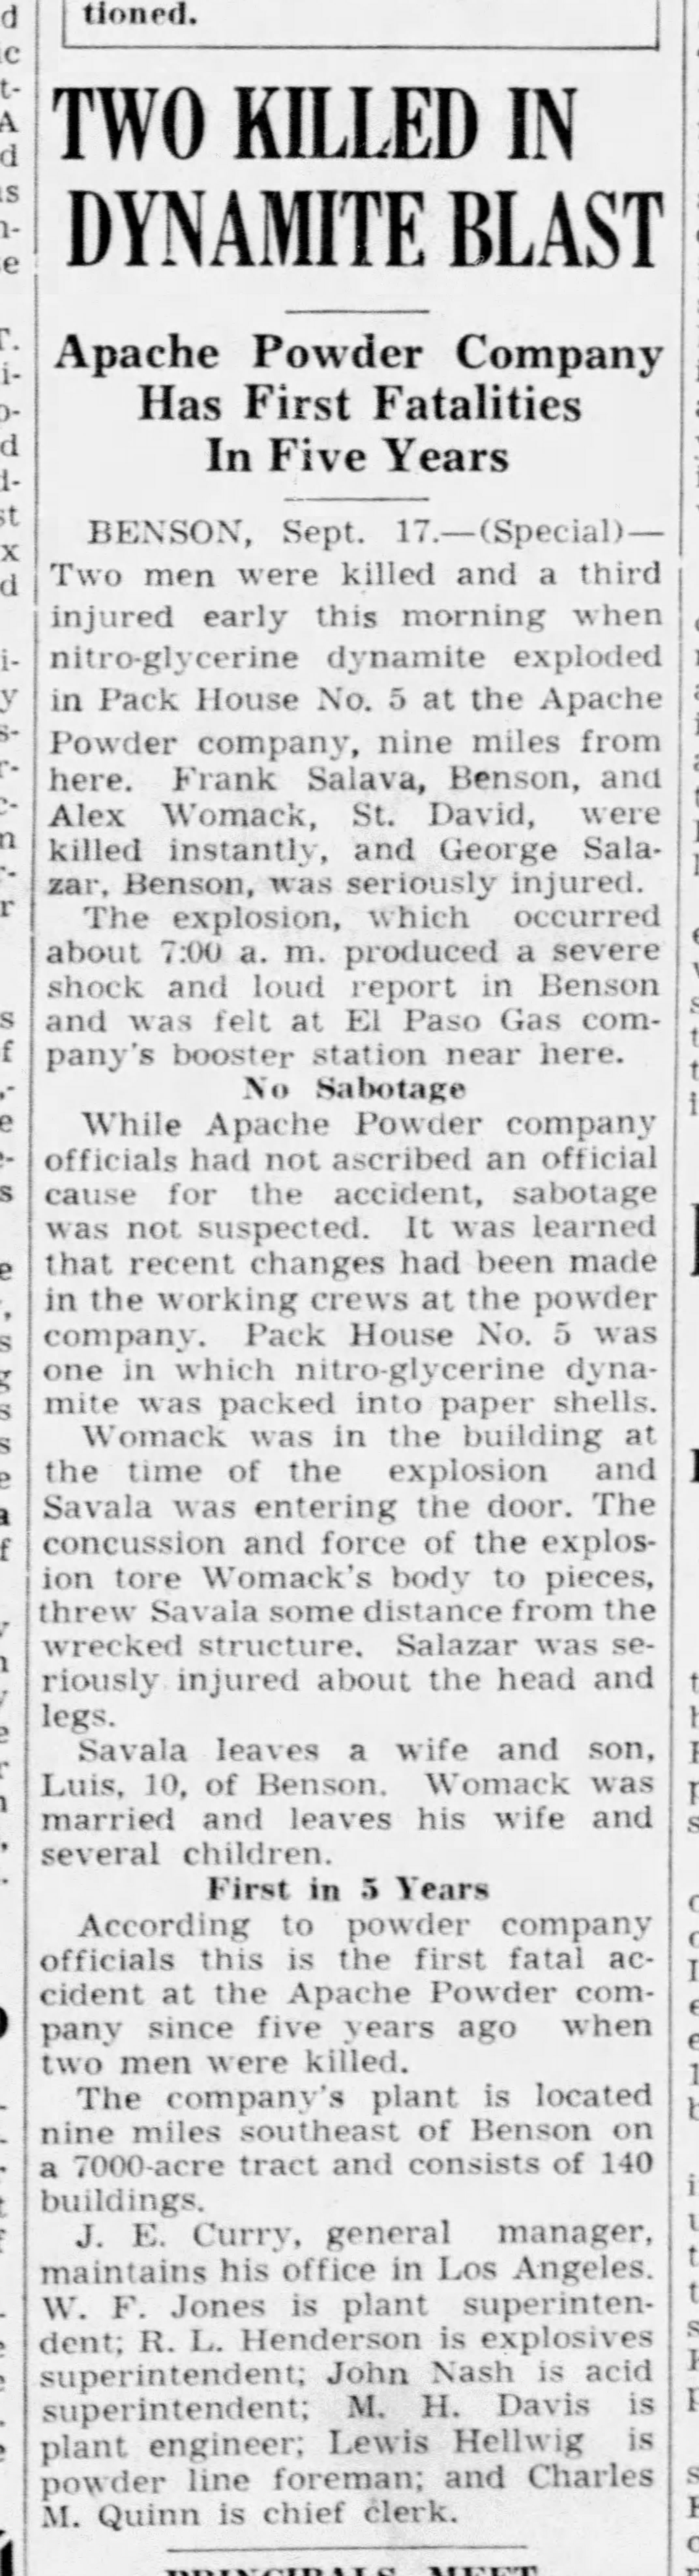 Arizona_Daily_Star_Thu__Sep_18__1941_alexwoamck